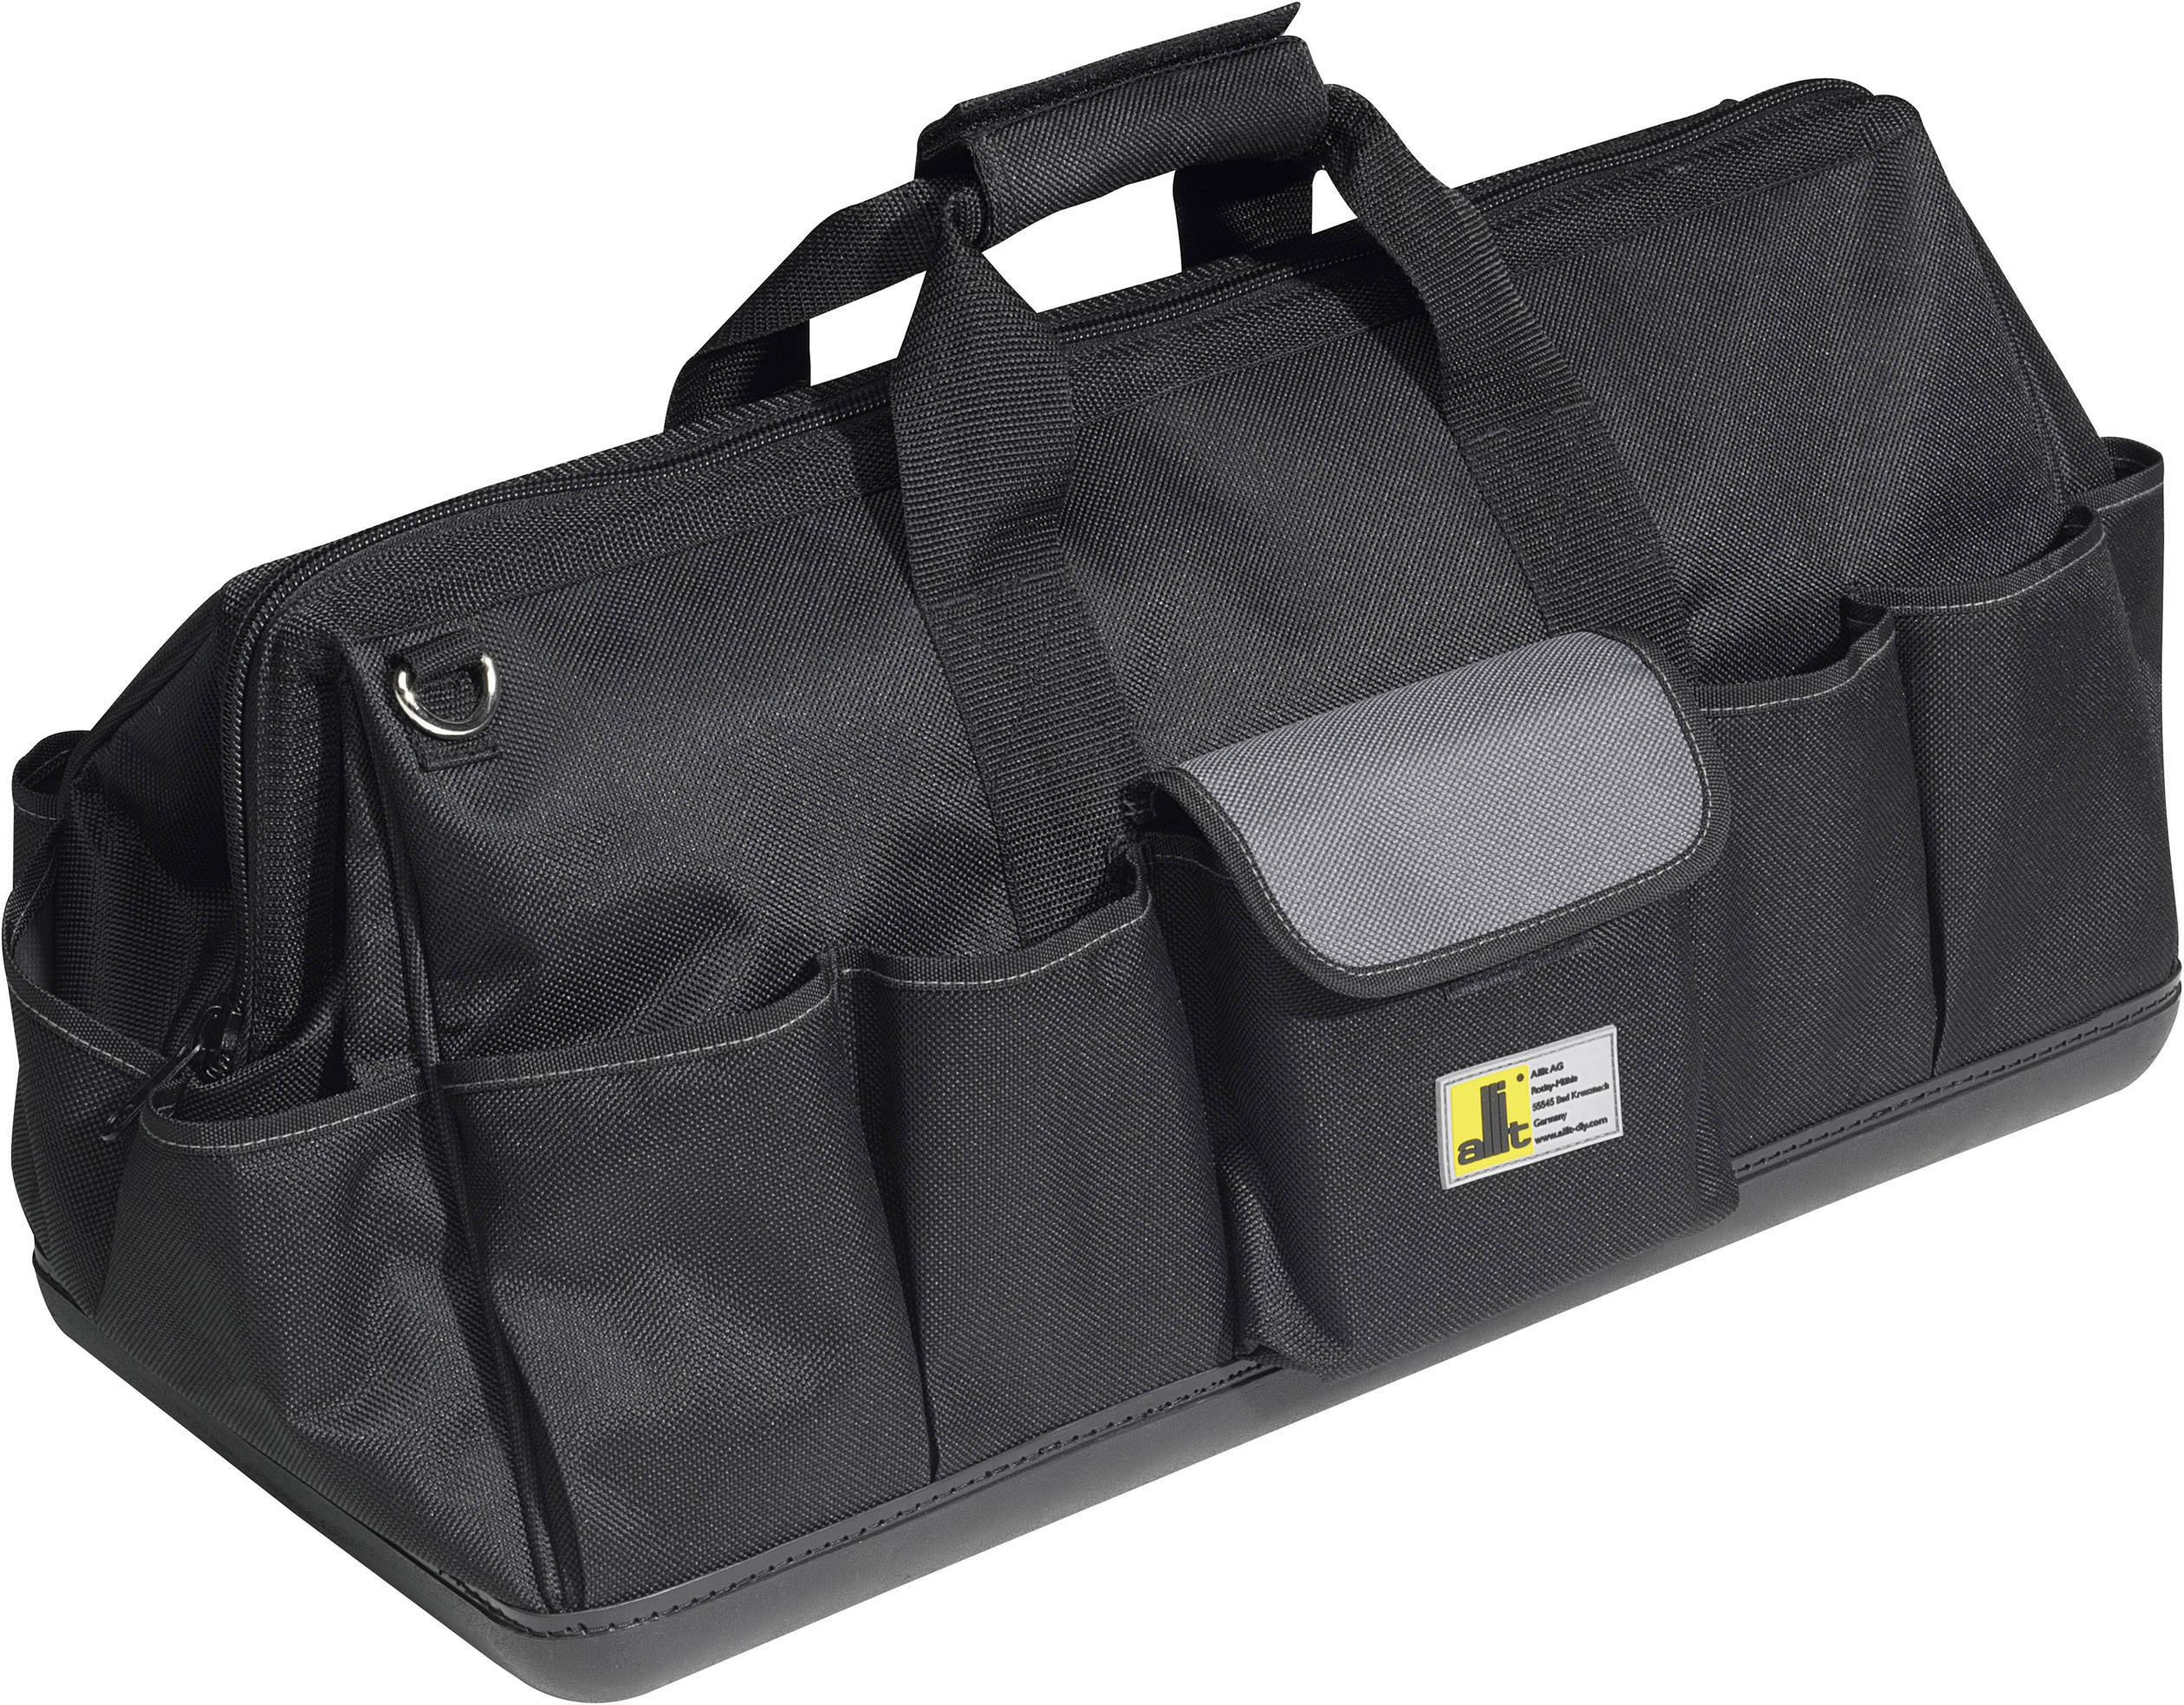 Allit McPlus Bag B 24 brašna na nářadí, prázdná Allit B24 479210, (d x š x v) 600 x 300 x 290 mm